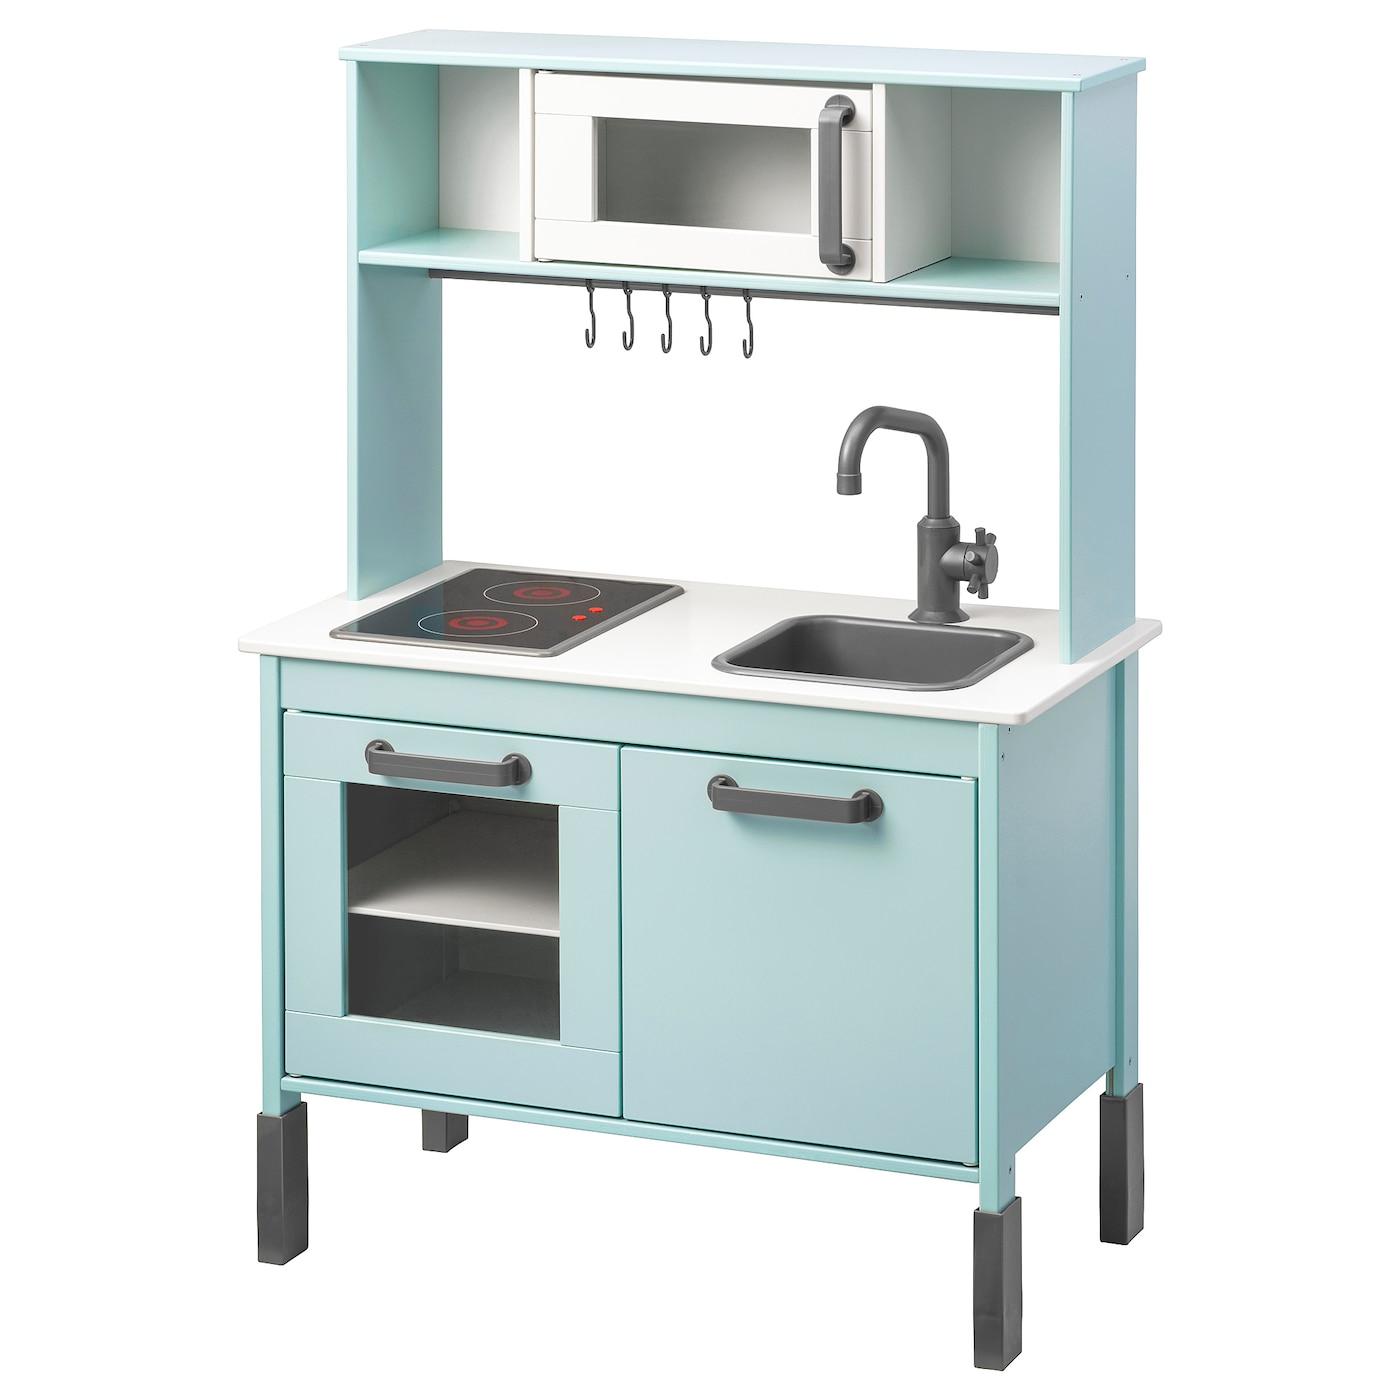 [IKEA] Lokal DUKTIG Kinderküche hellblau | Micro Camper Küche